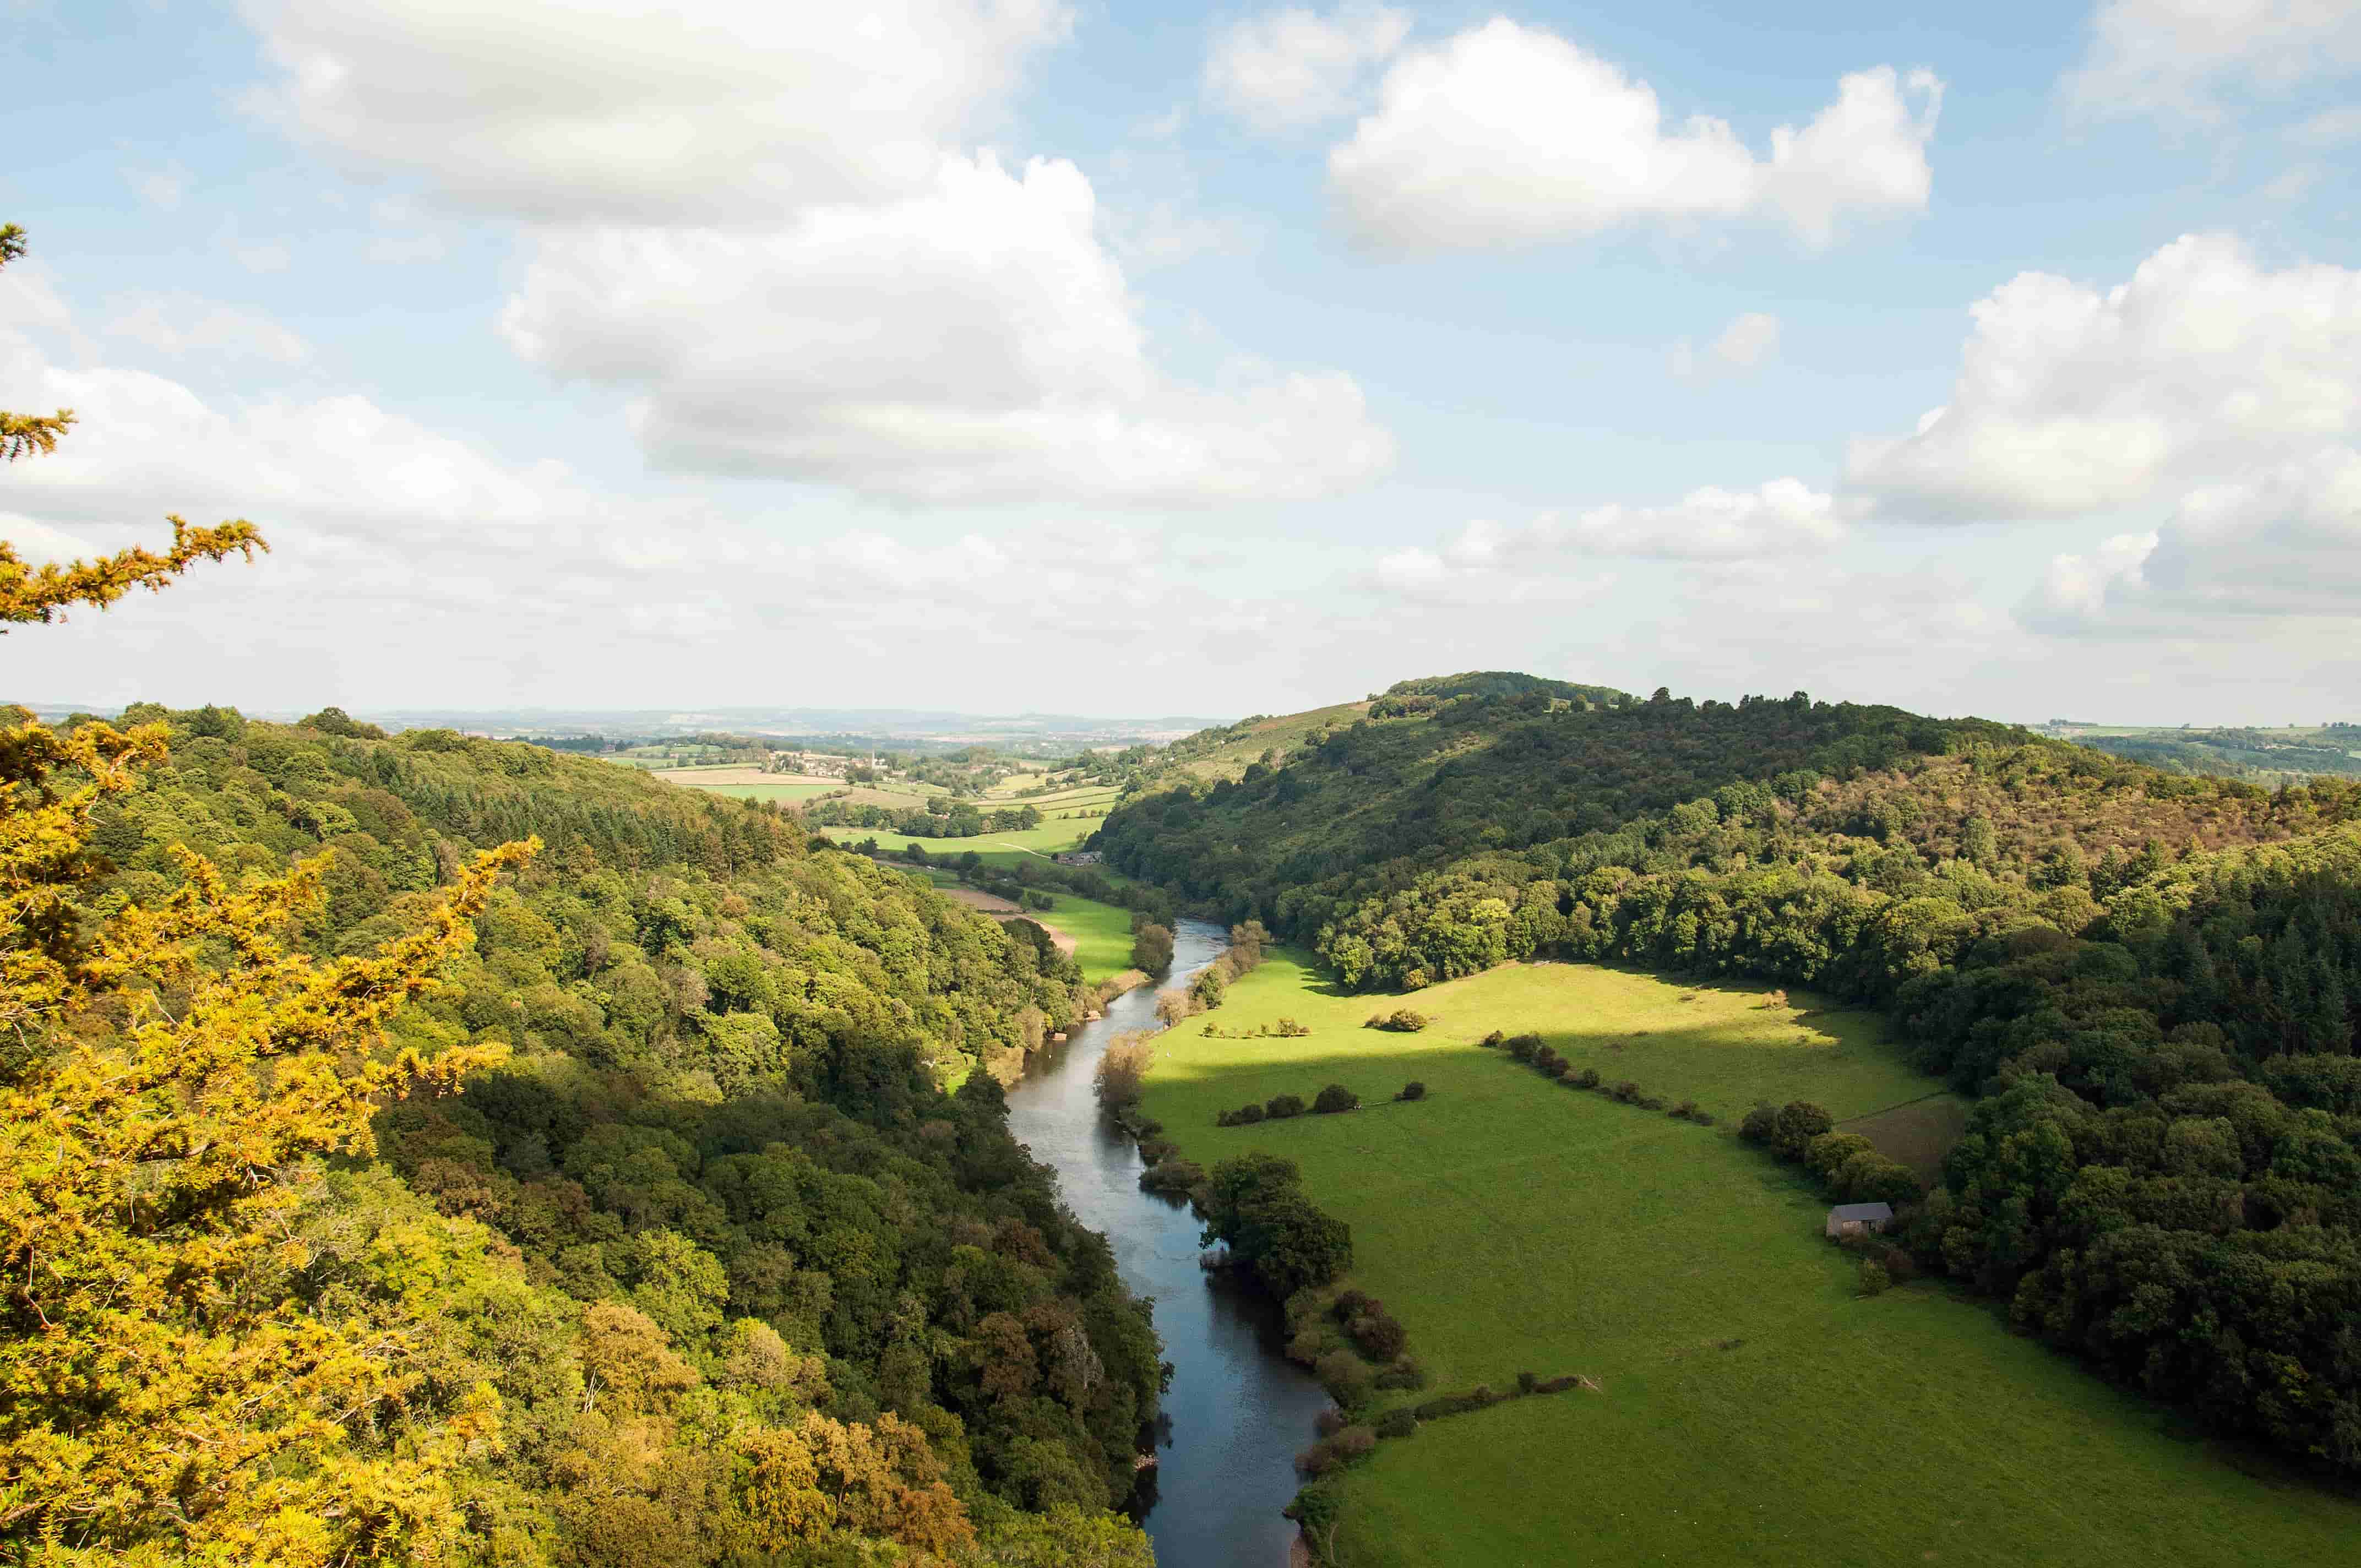 Canoeing and Kayaking In UK, England, Symonds Yat, River Wye